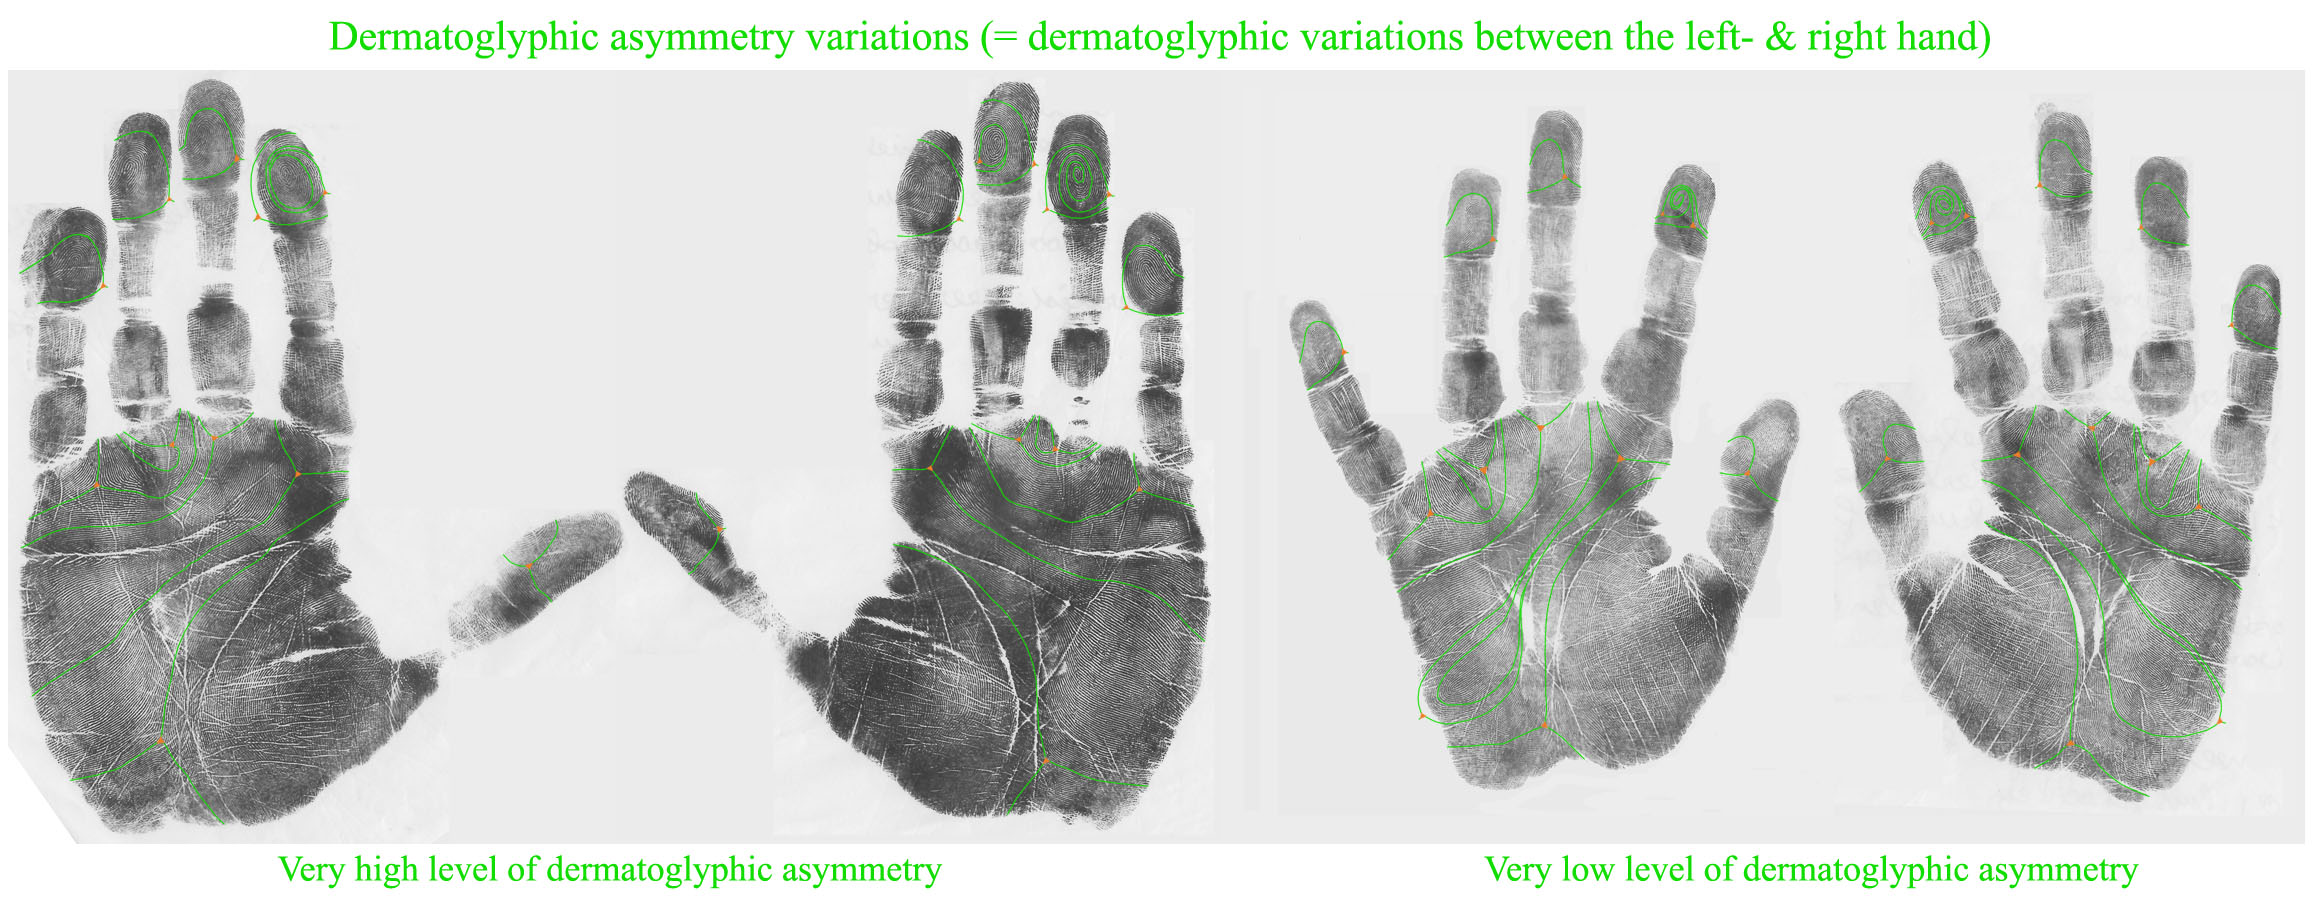 Dermatoglyphic asymmetry variations: very high versus very low.